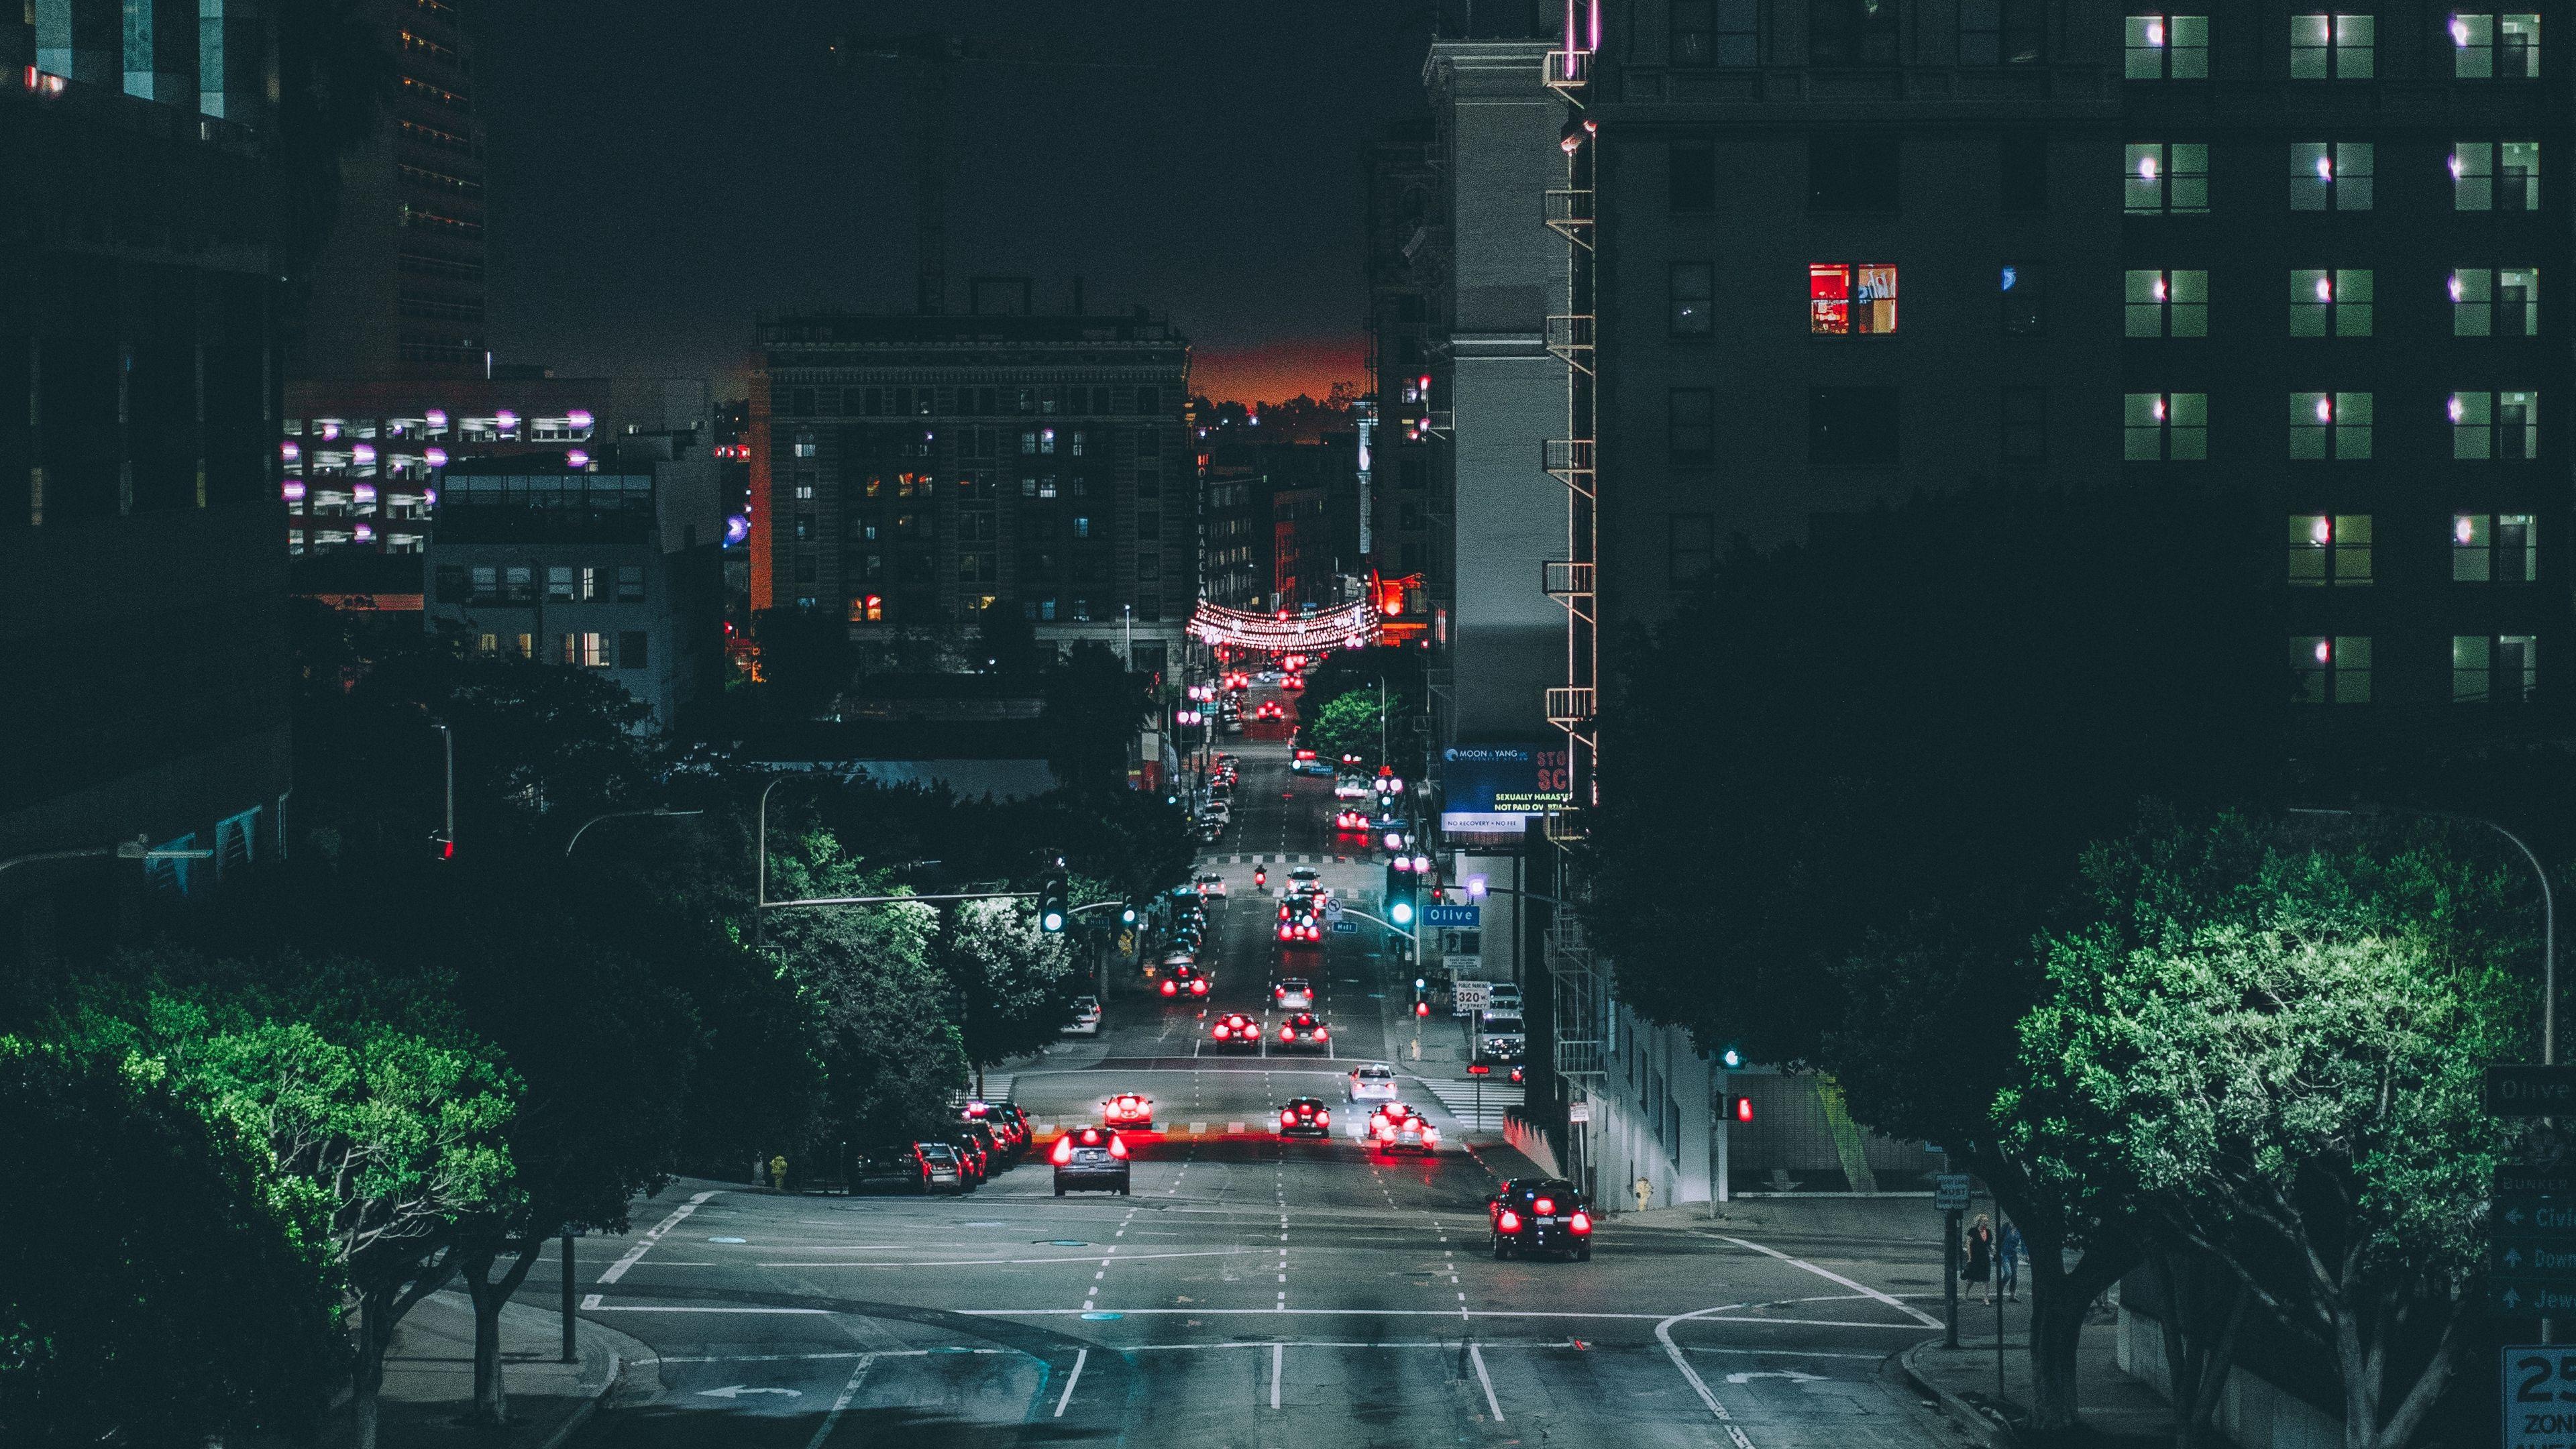 Los Angeles Night City Road Traffic 4k Road Night City Los Angeles In 2020 Night City City Wallpaper City